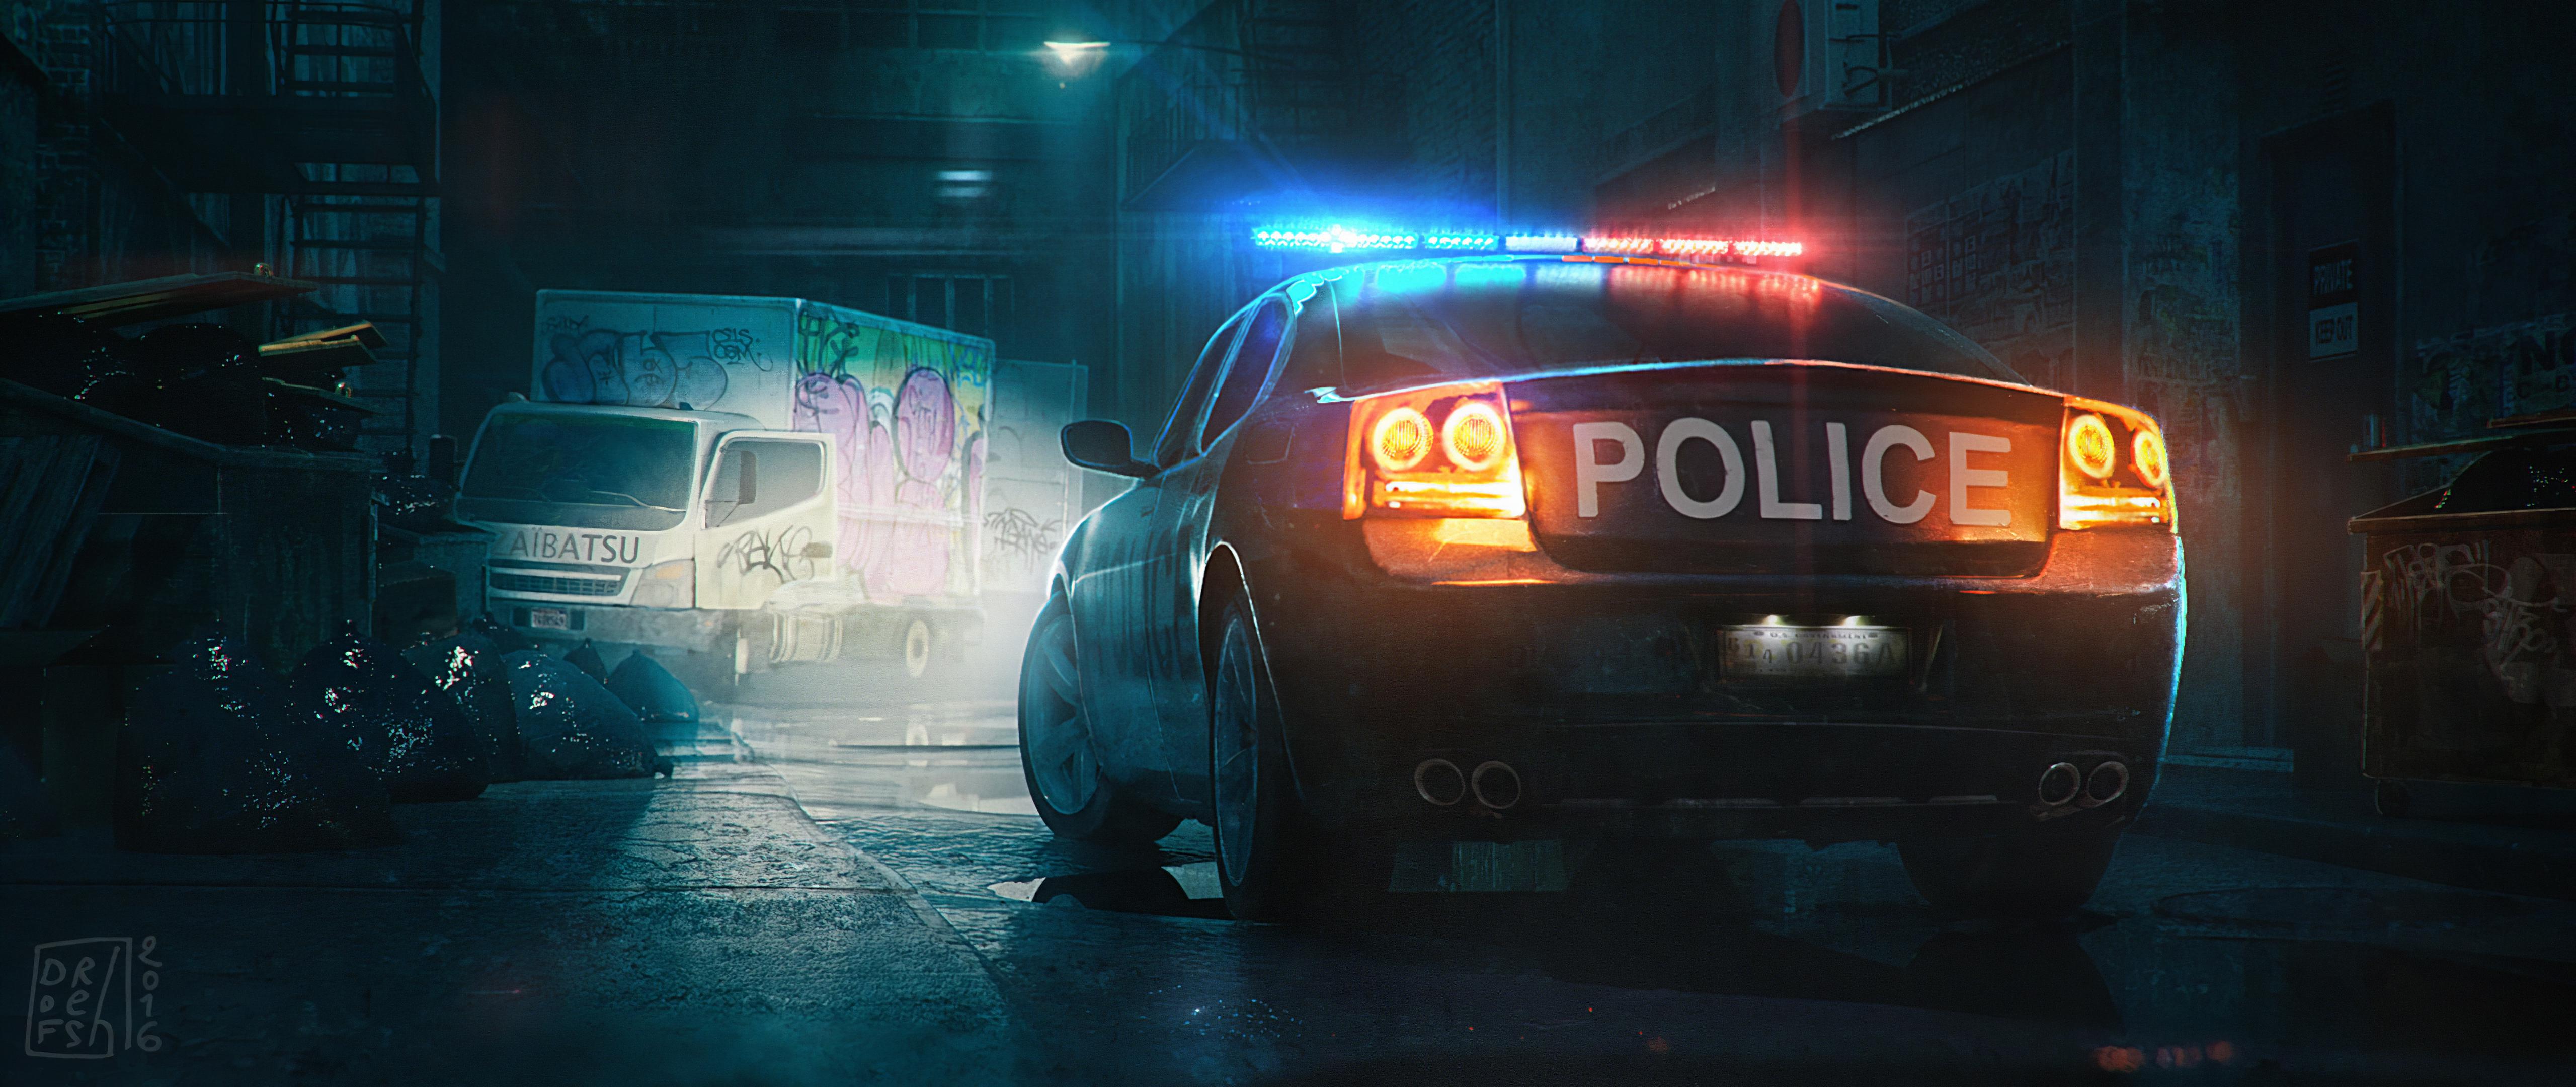 police patrol car digital art 1578255124 - Police Patrol Car Digital Art -